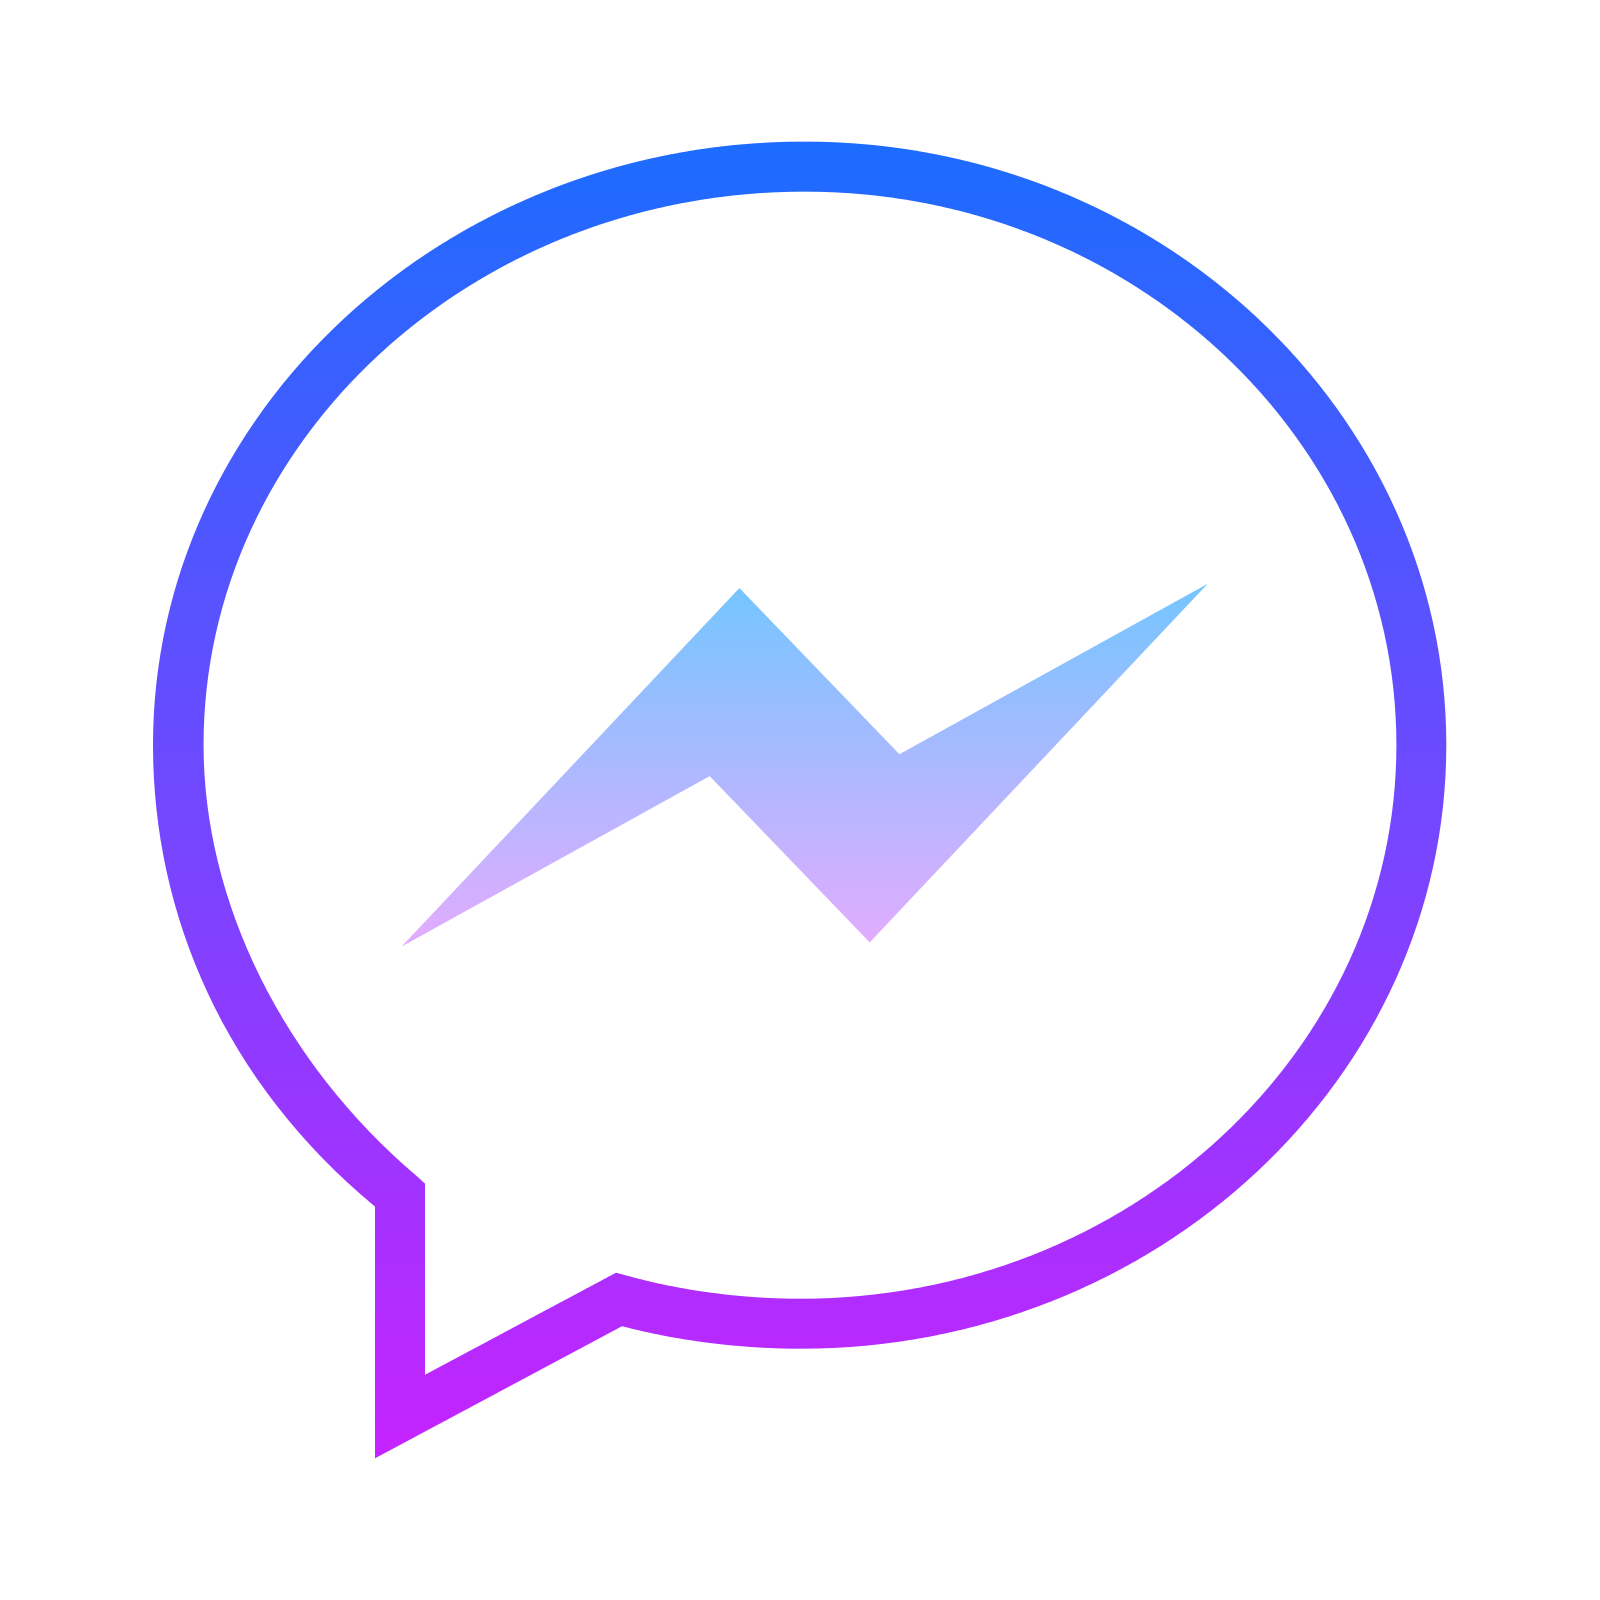 Messenger png transparent images. Facebook clipart psd